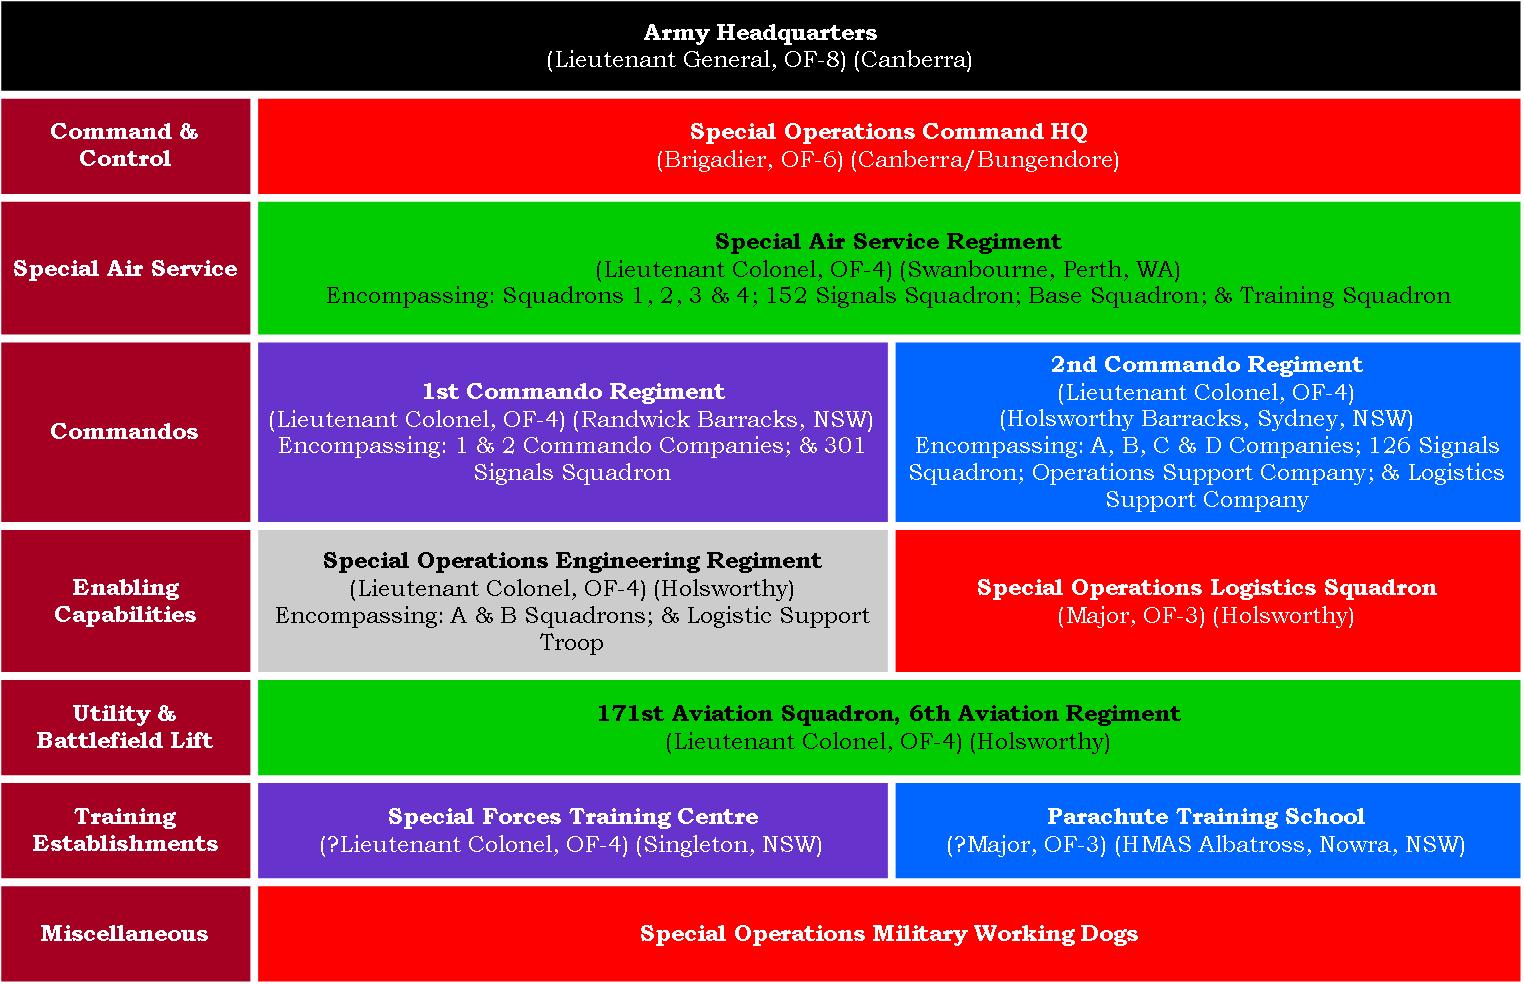 21,00 - Figure 2, Org of SOCOMD